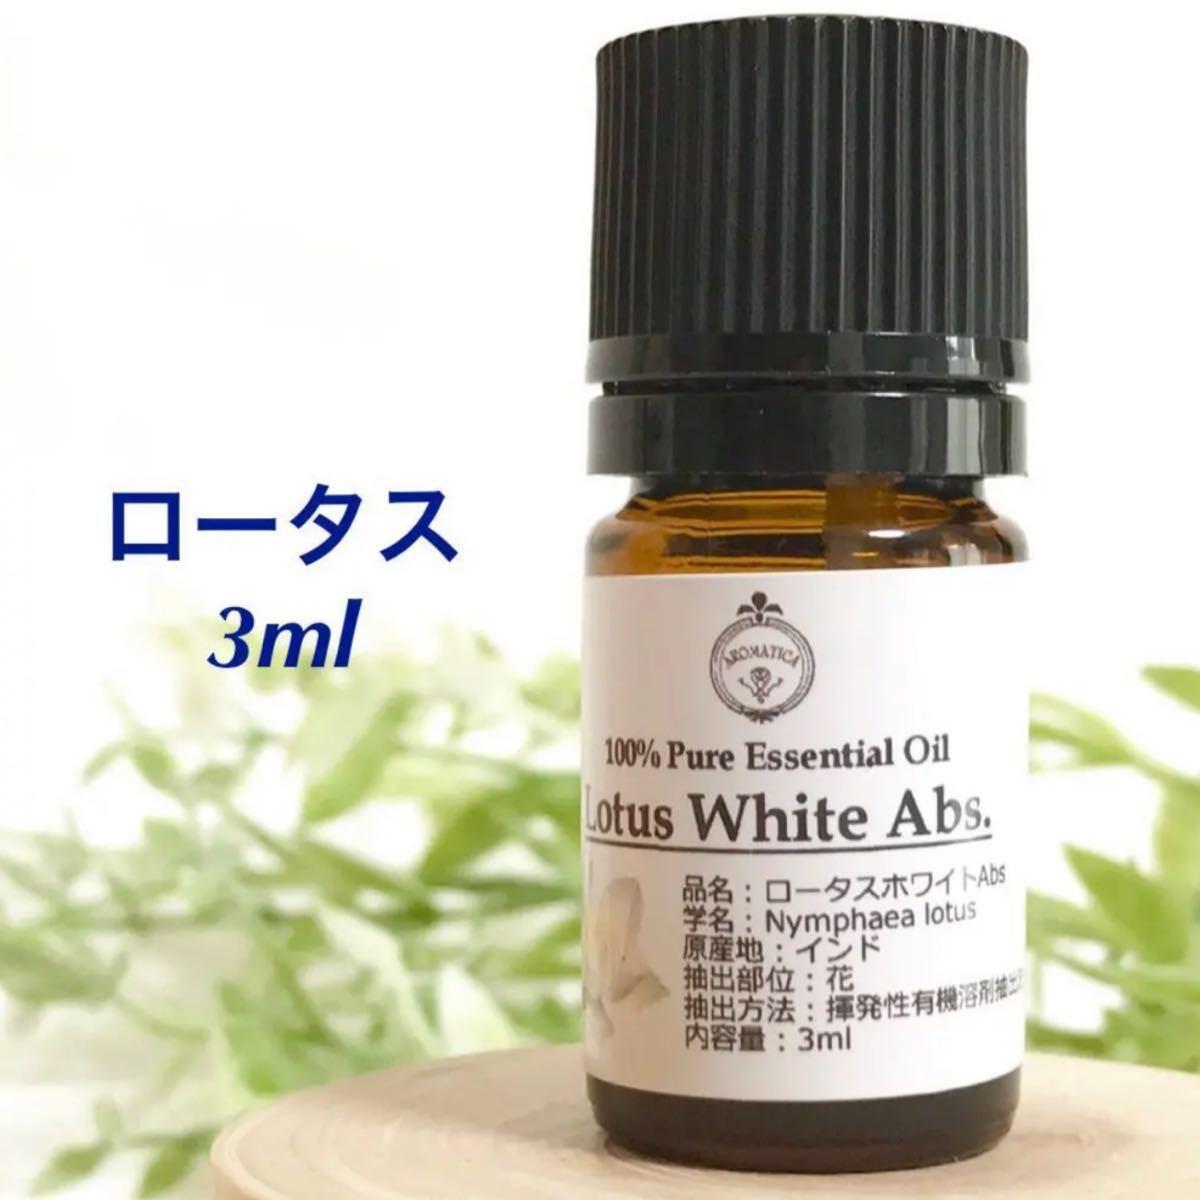 3ml★ロータス・ホワイト★エッセンシャルオイル★アブソリュート★アロマ